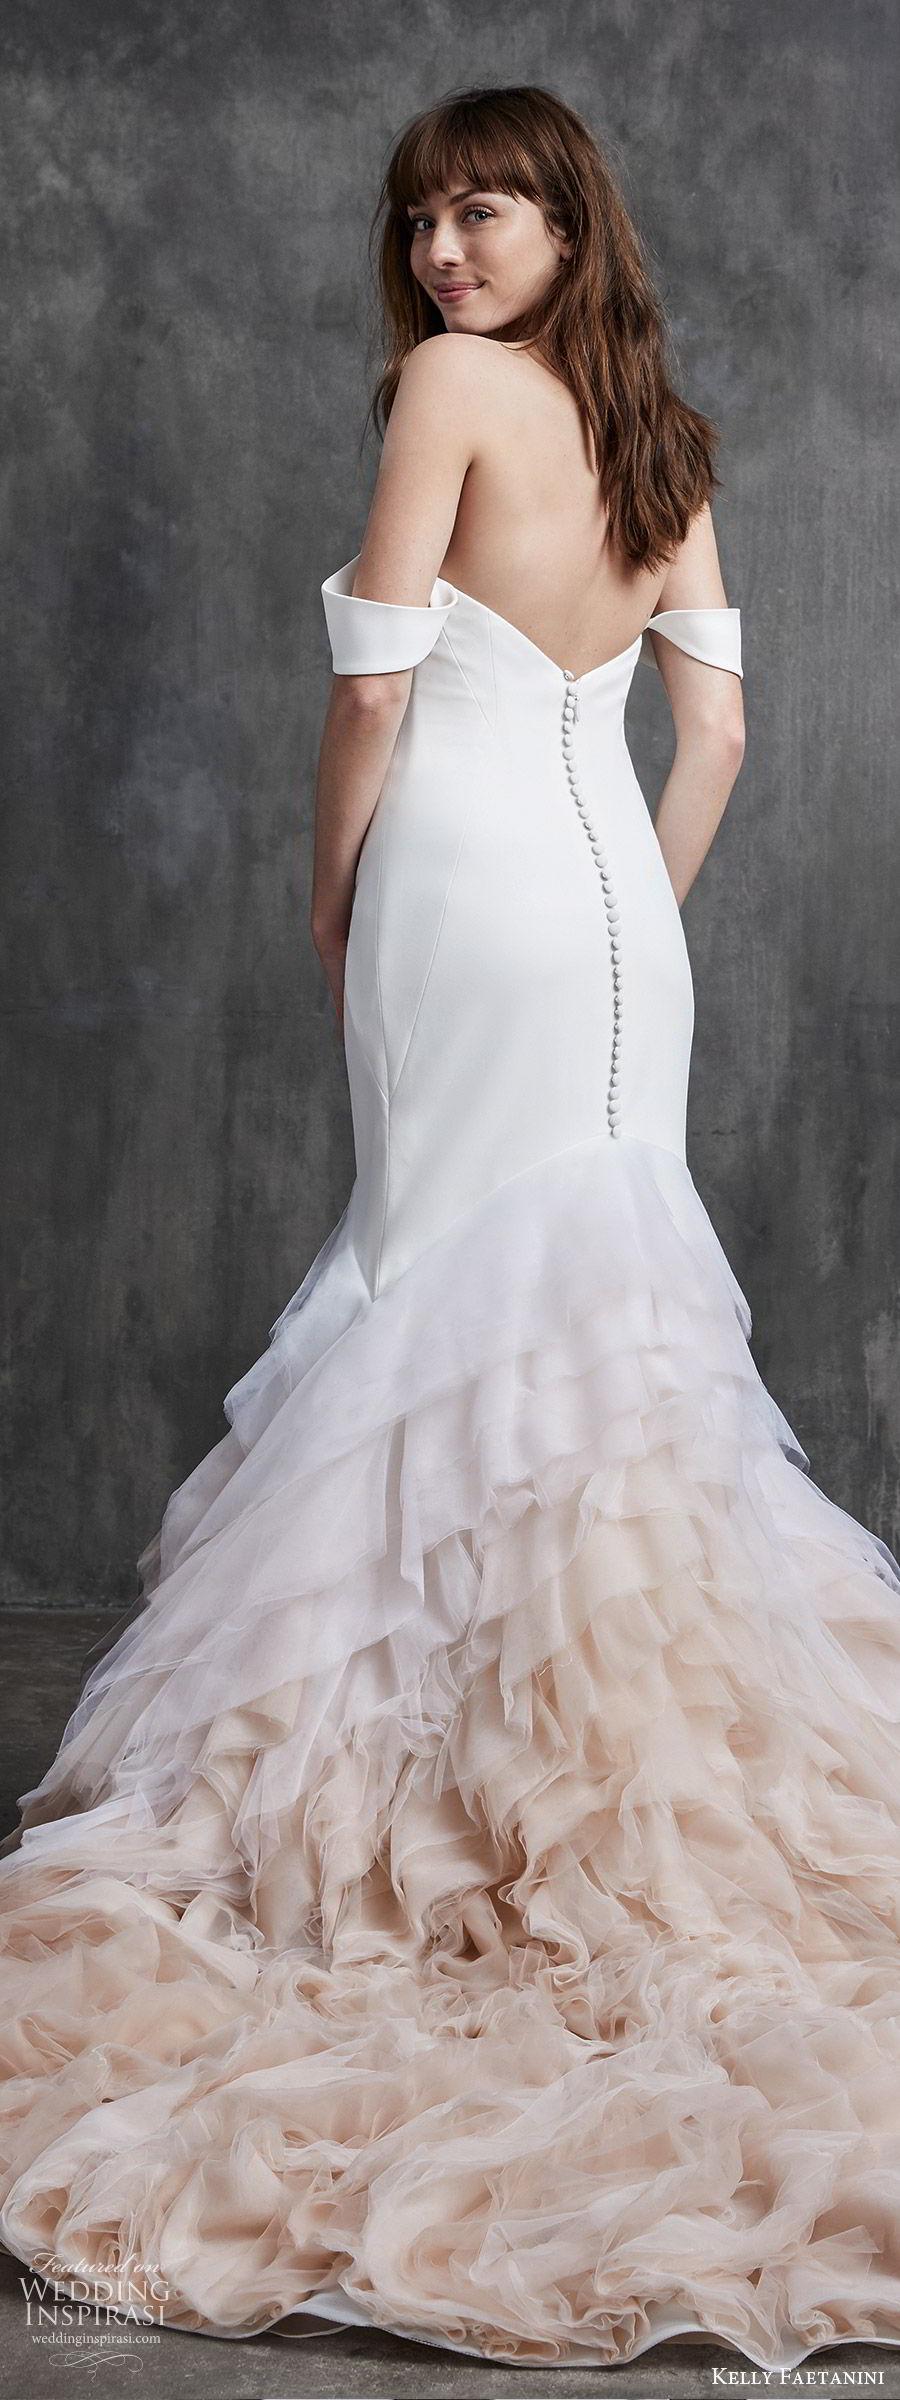 kelly faetanini spring 2020 bridal off shoulder split sweetheart neckline fit flare mermaid ruffle skirt wedding dress (5) clean chapel train ombre blush zbv